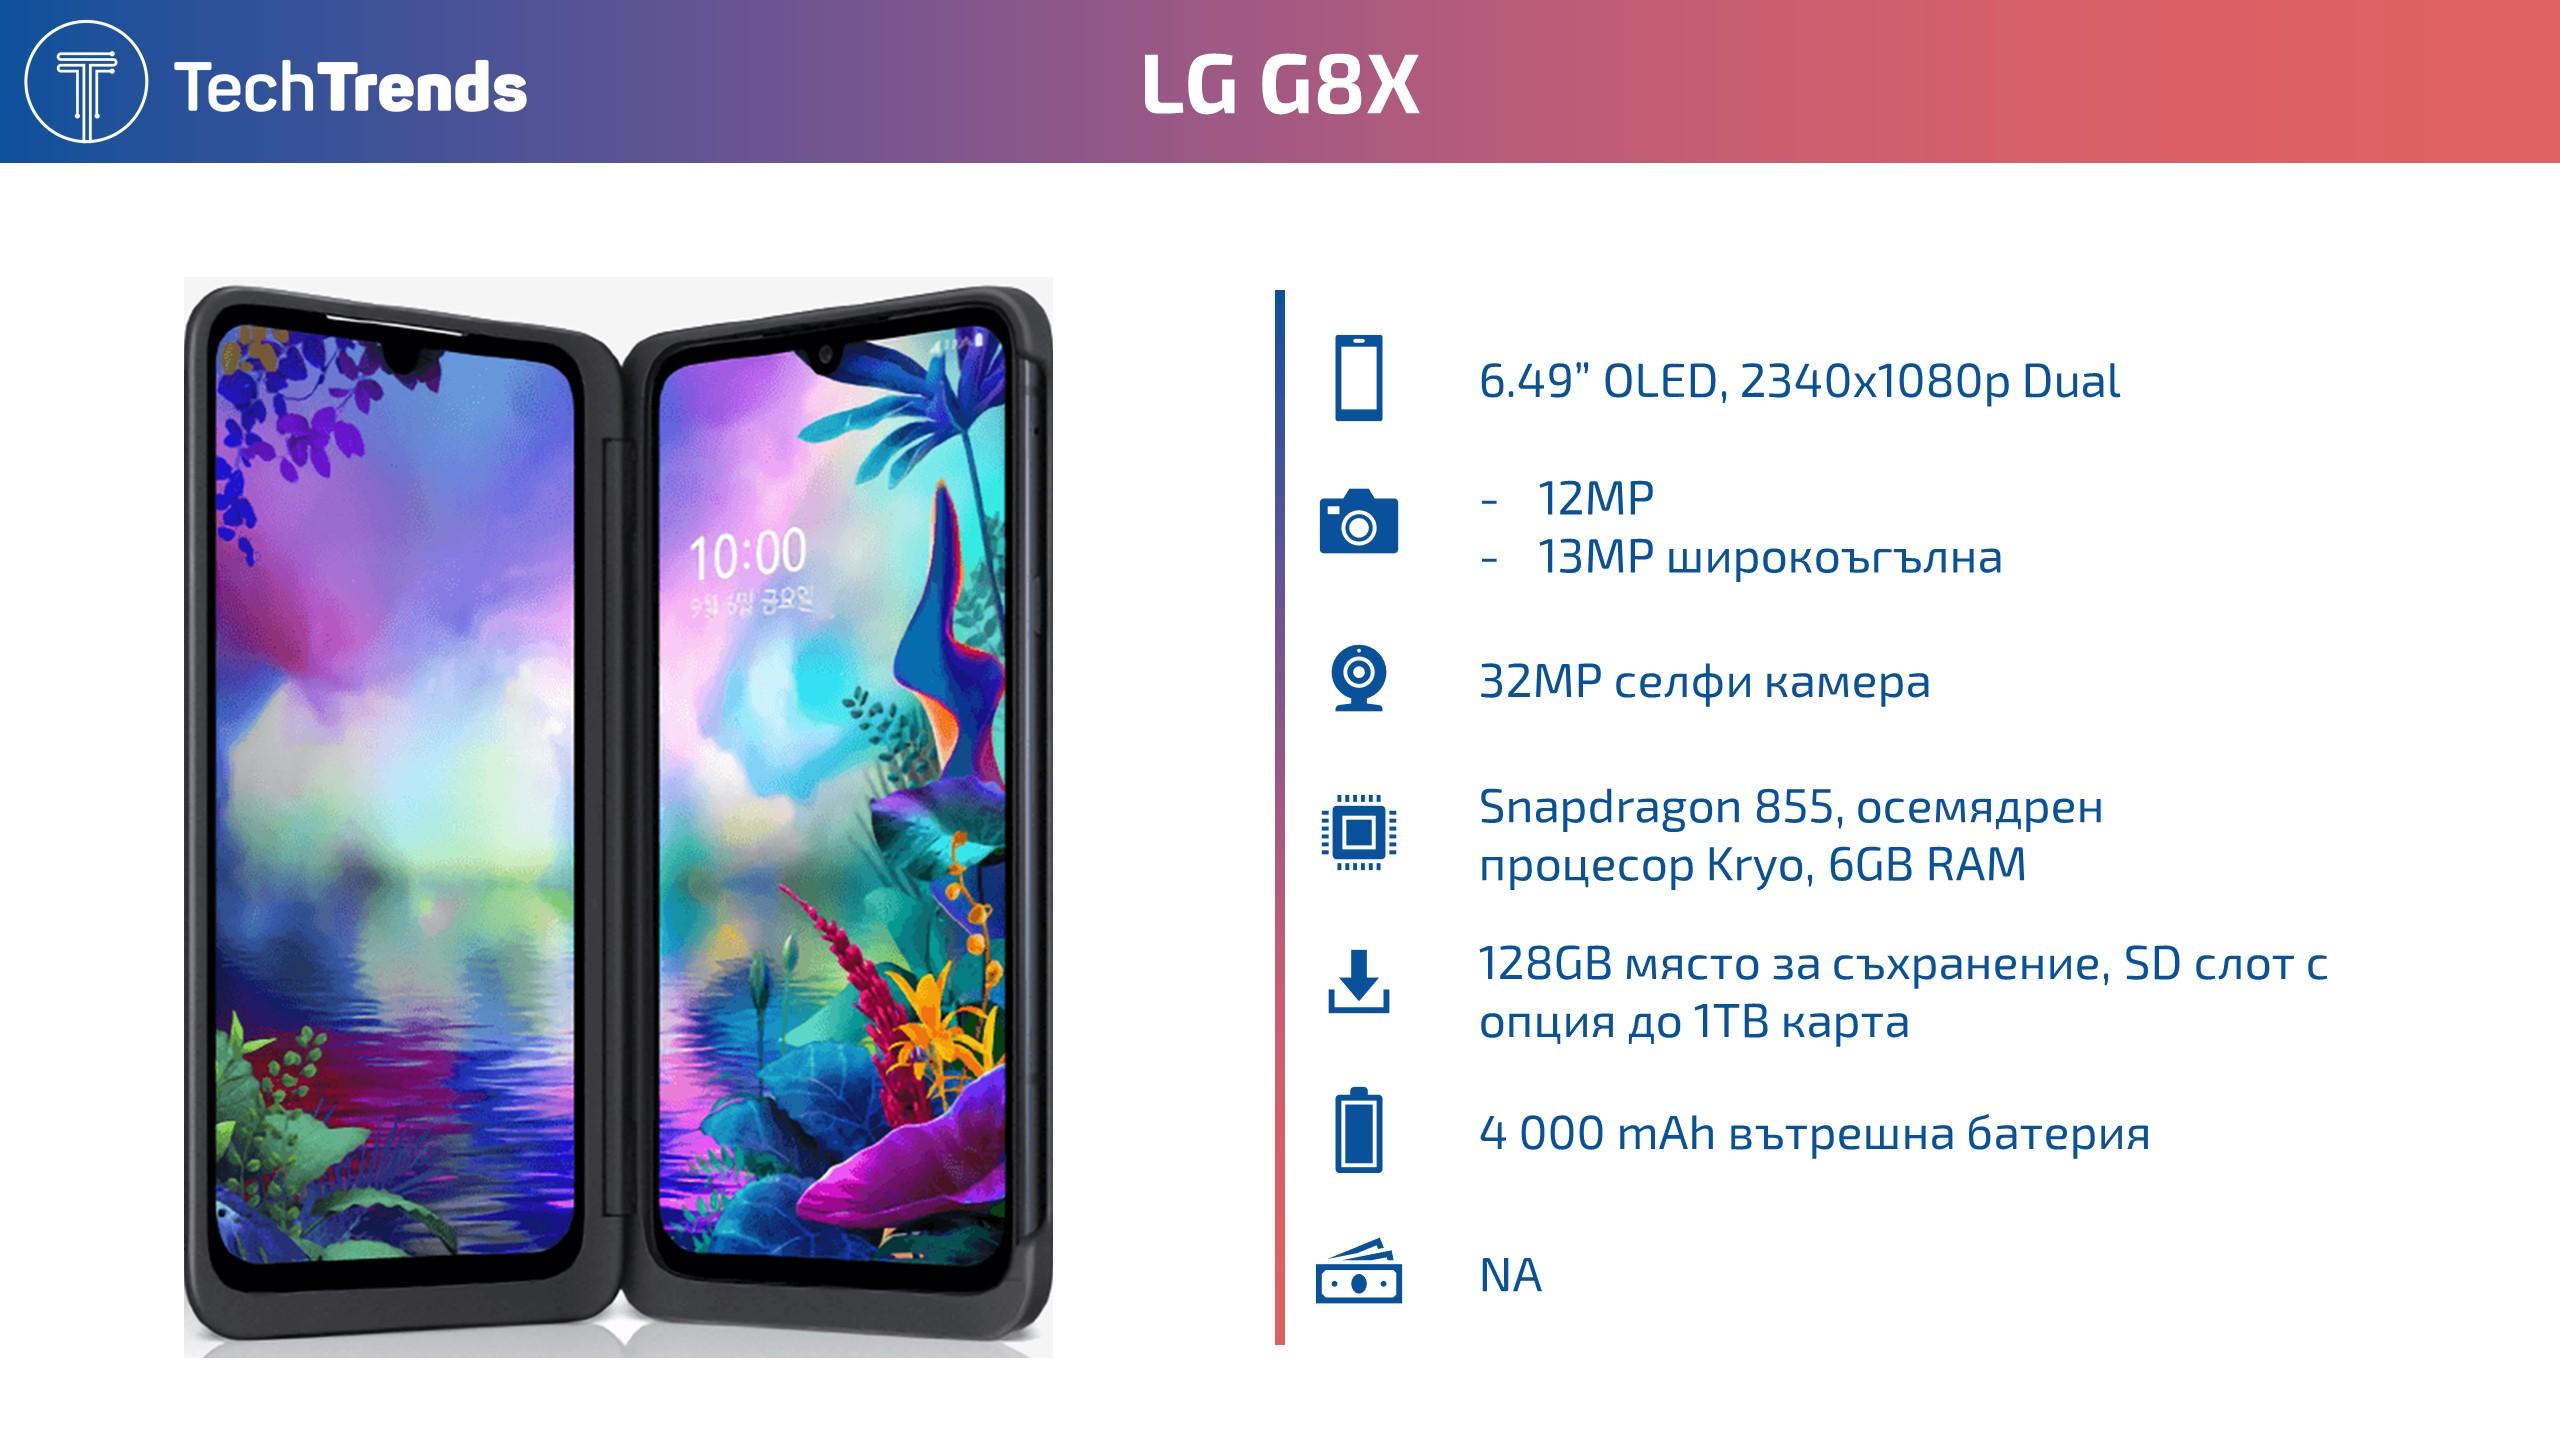 LG G8X Infographic